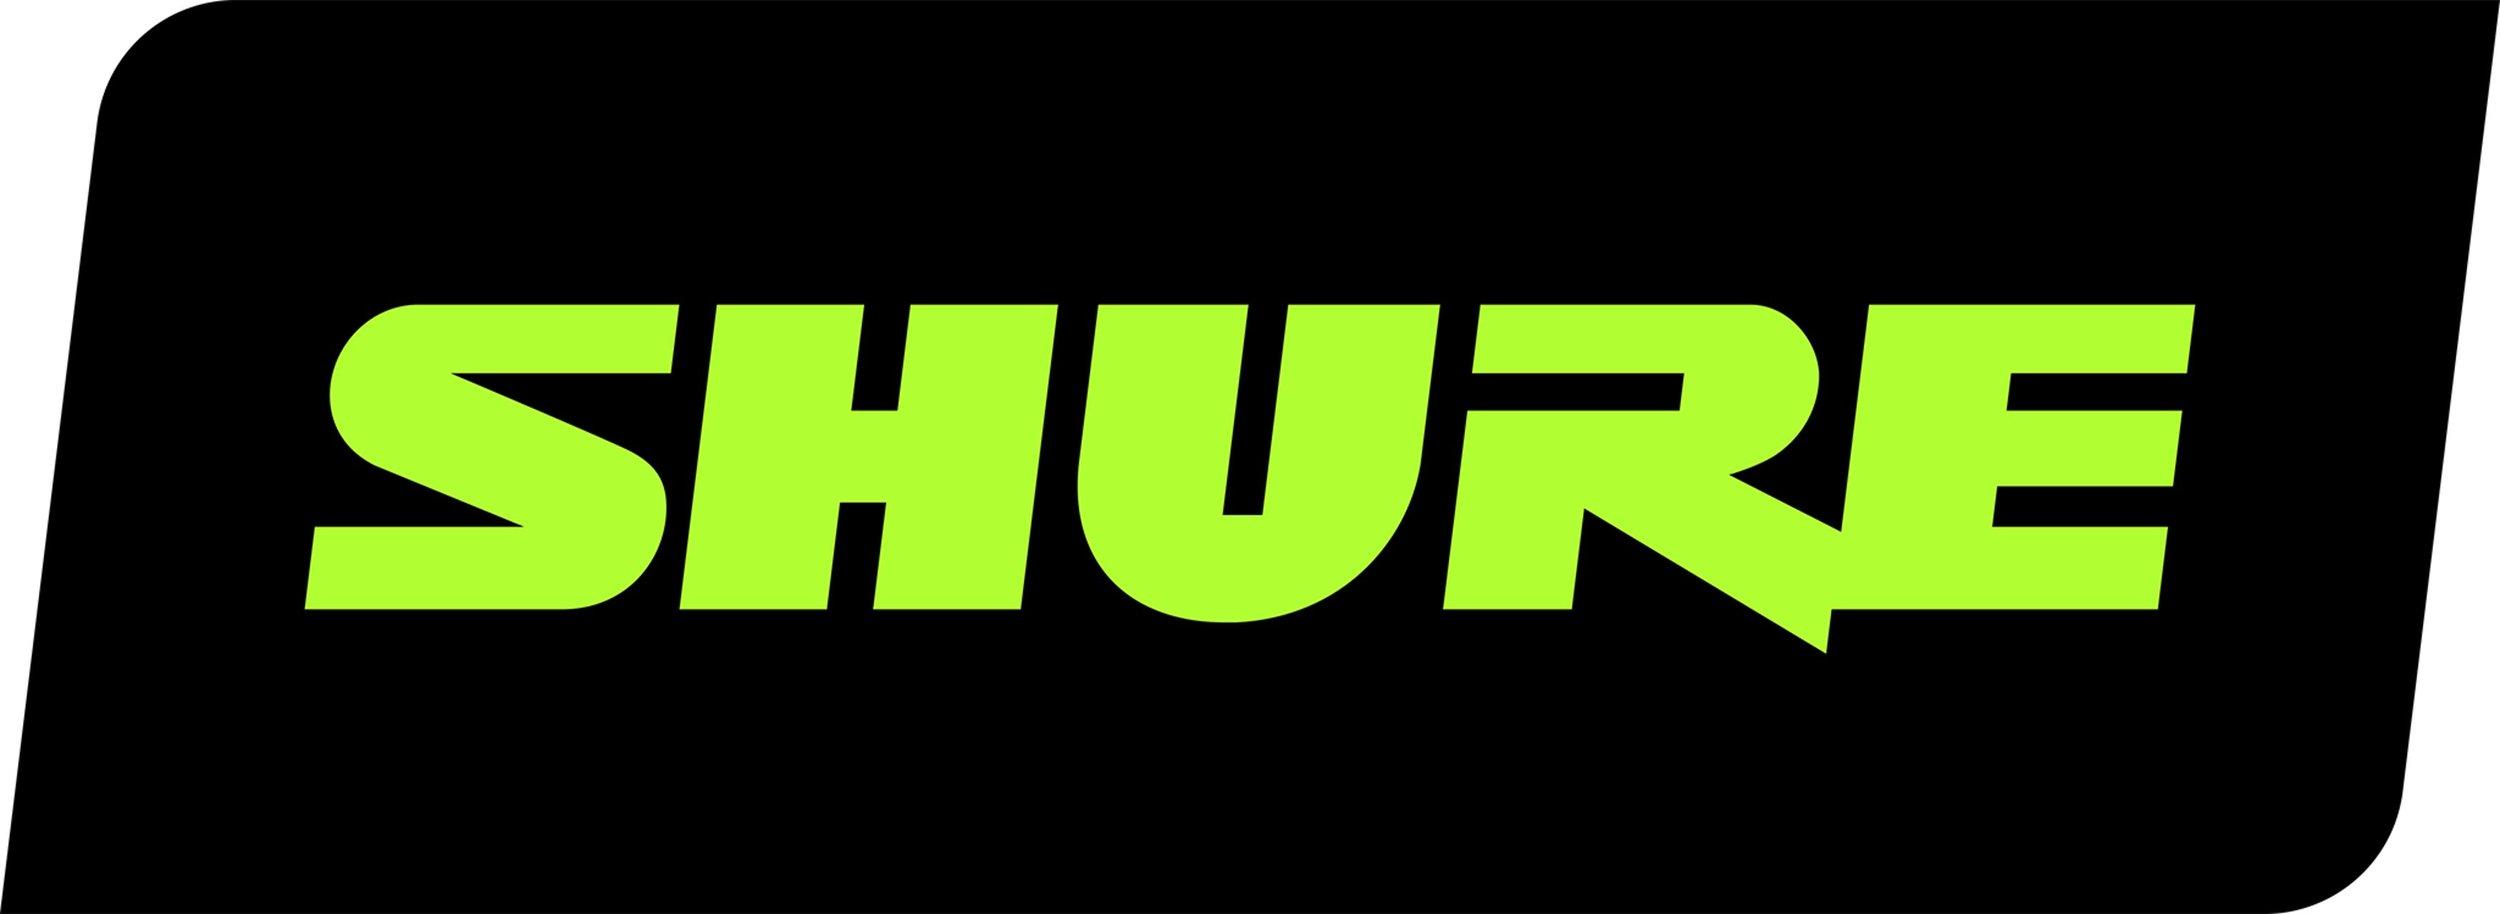 shure new logo.jpeg